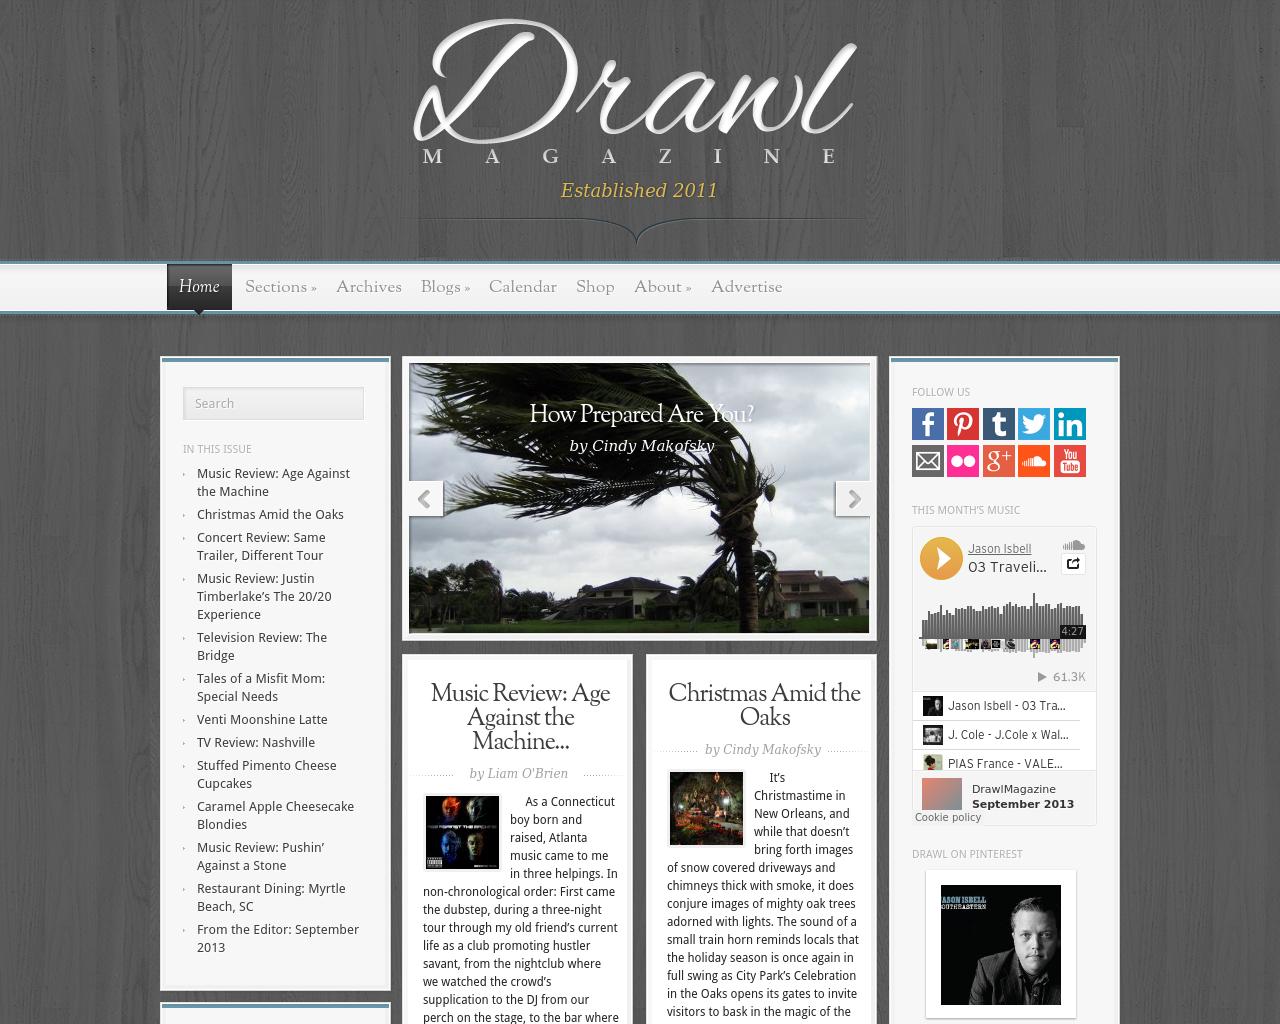 Drawlmag.com-Advertising-Reviews-Pricing